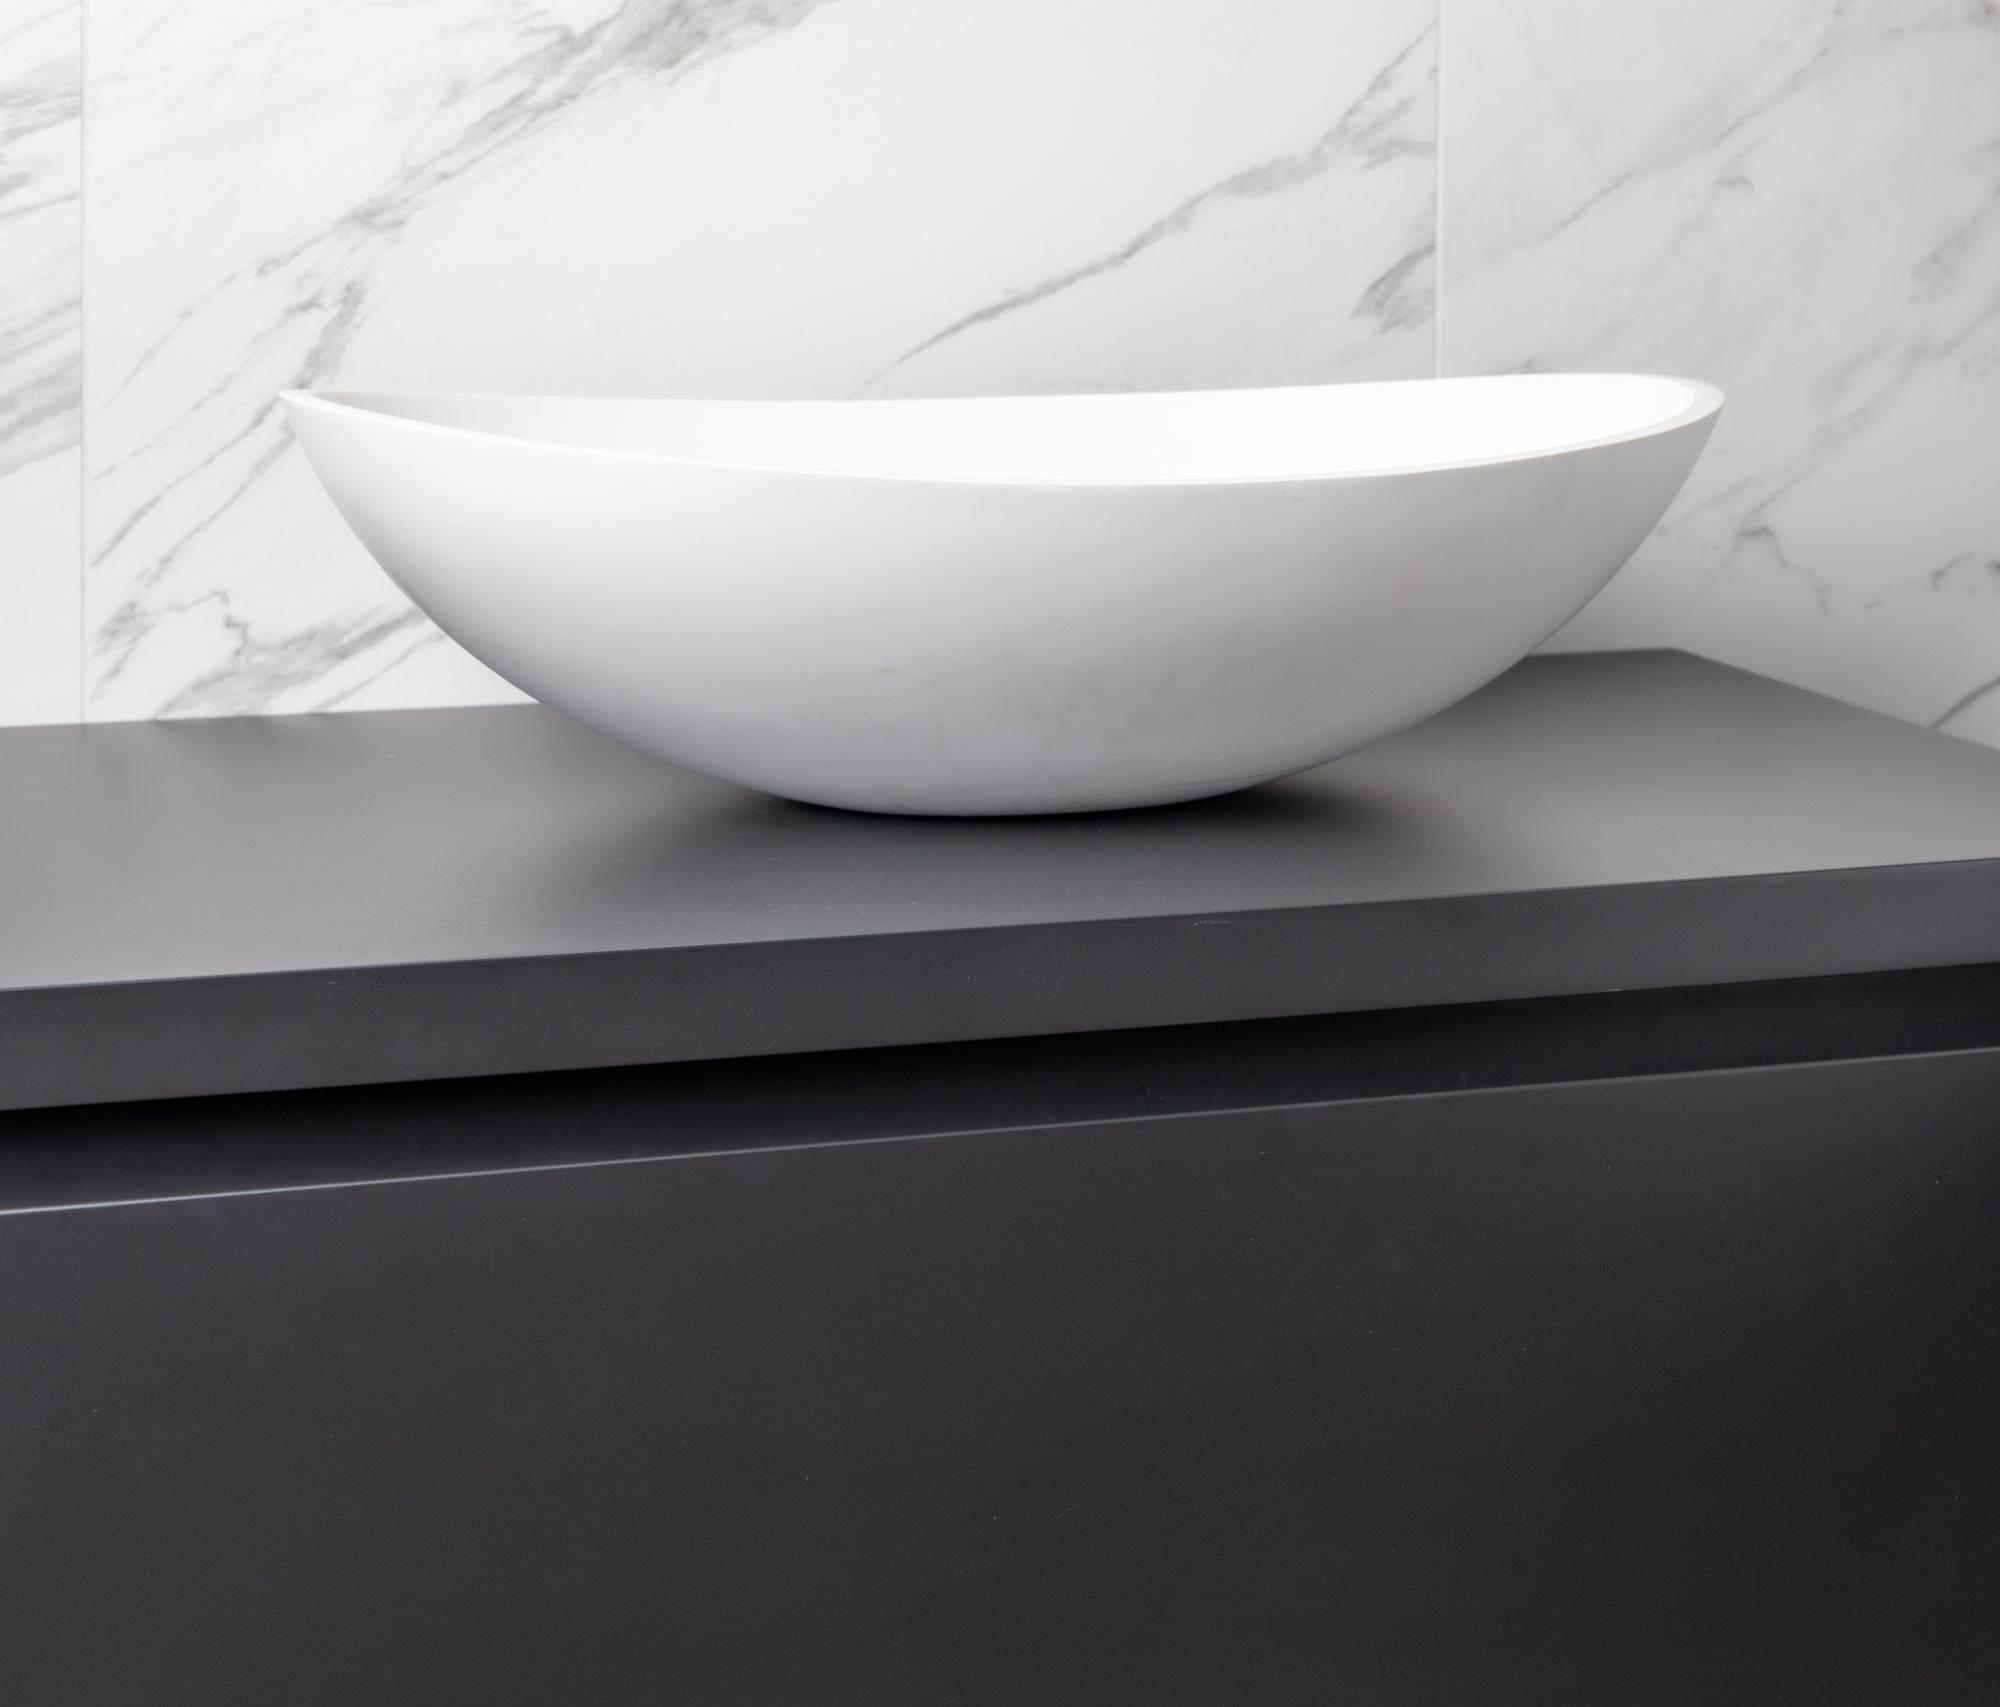 zwart-badkamermeubel-witte-waskom.jpg